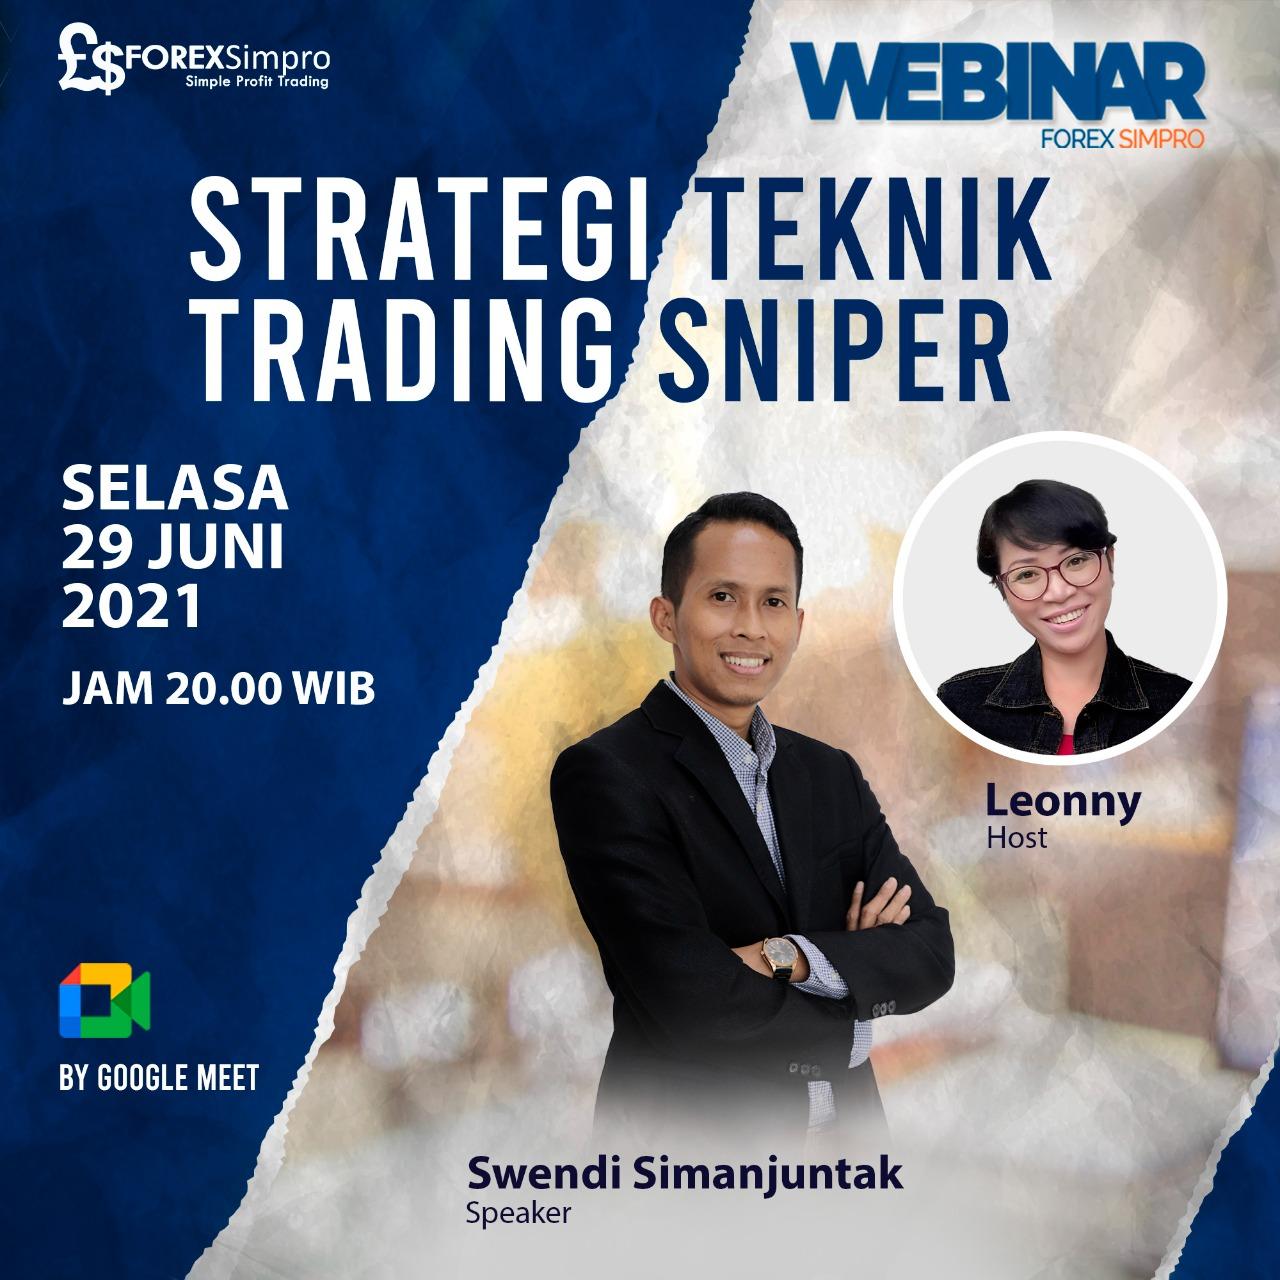 Webinar Strategi Teknik Trading Sniper